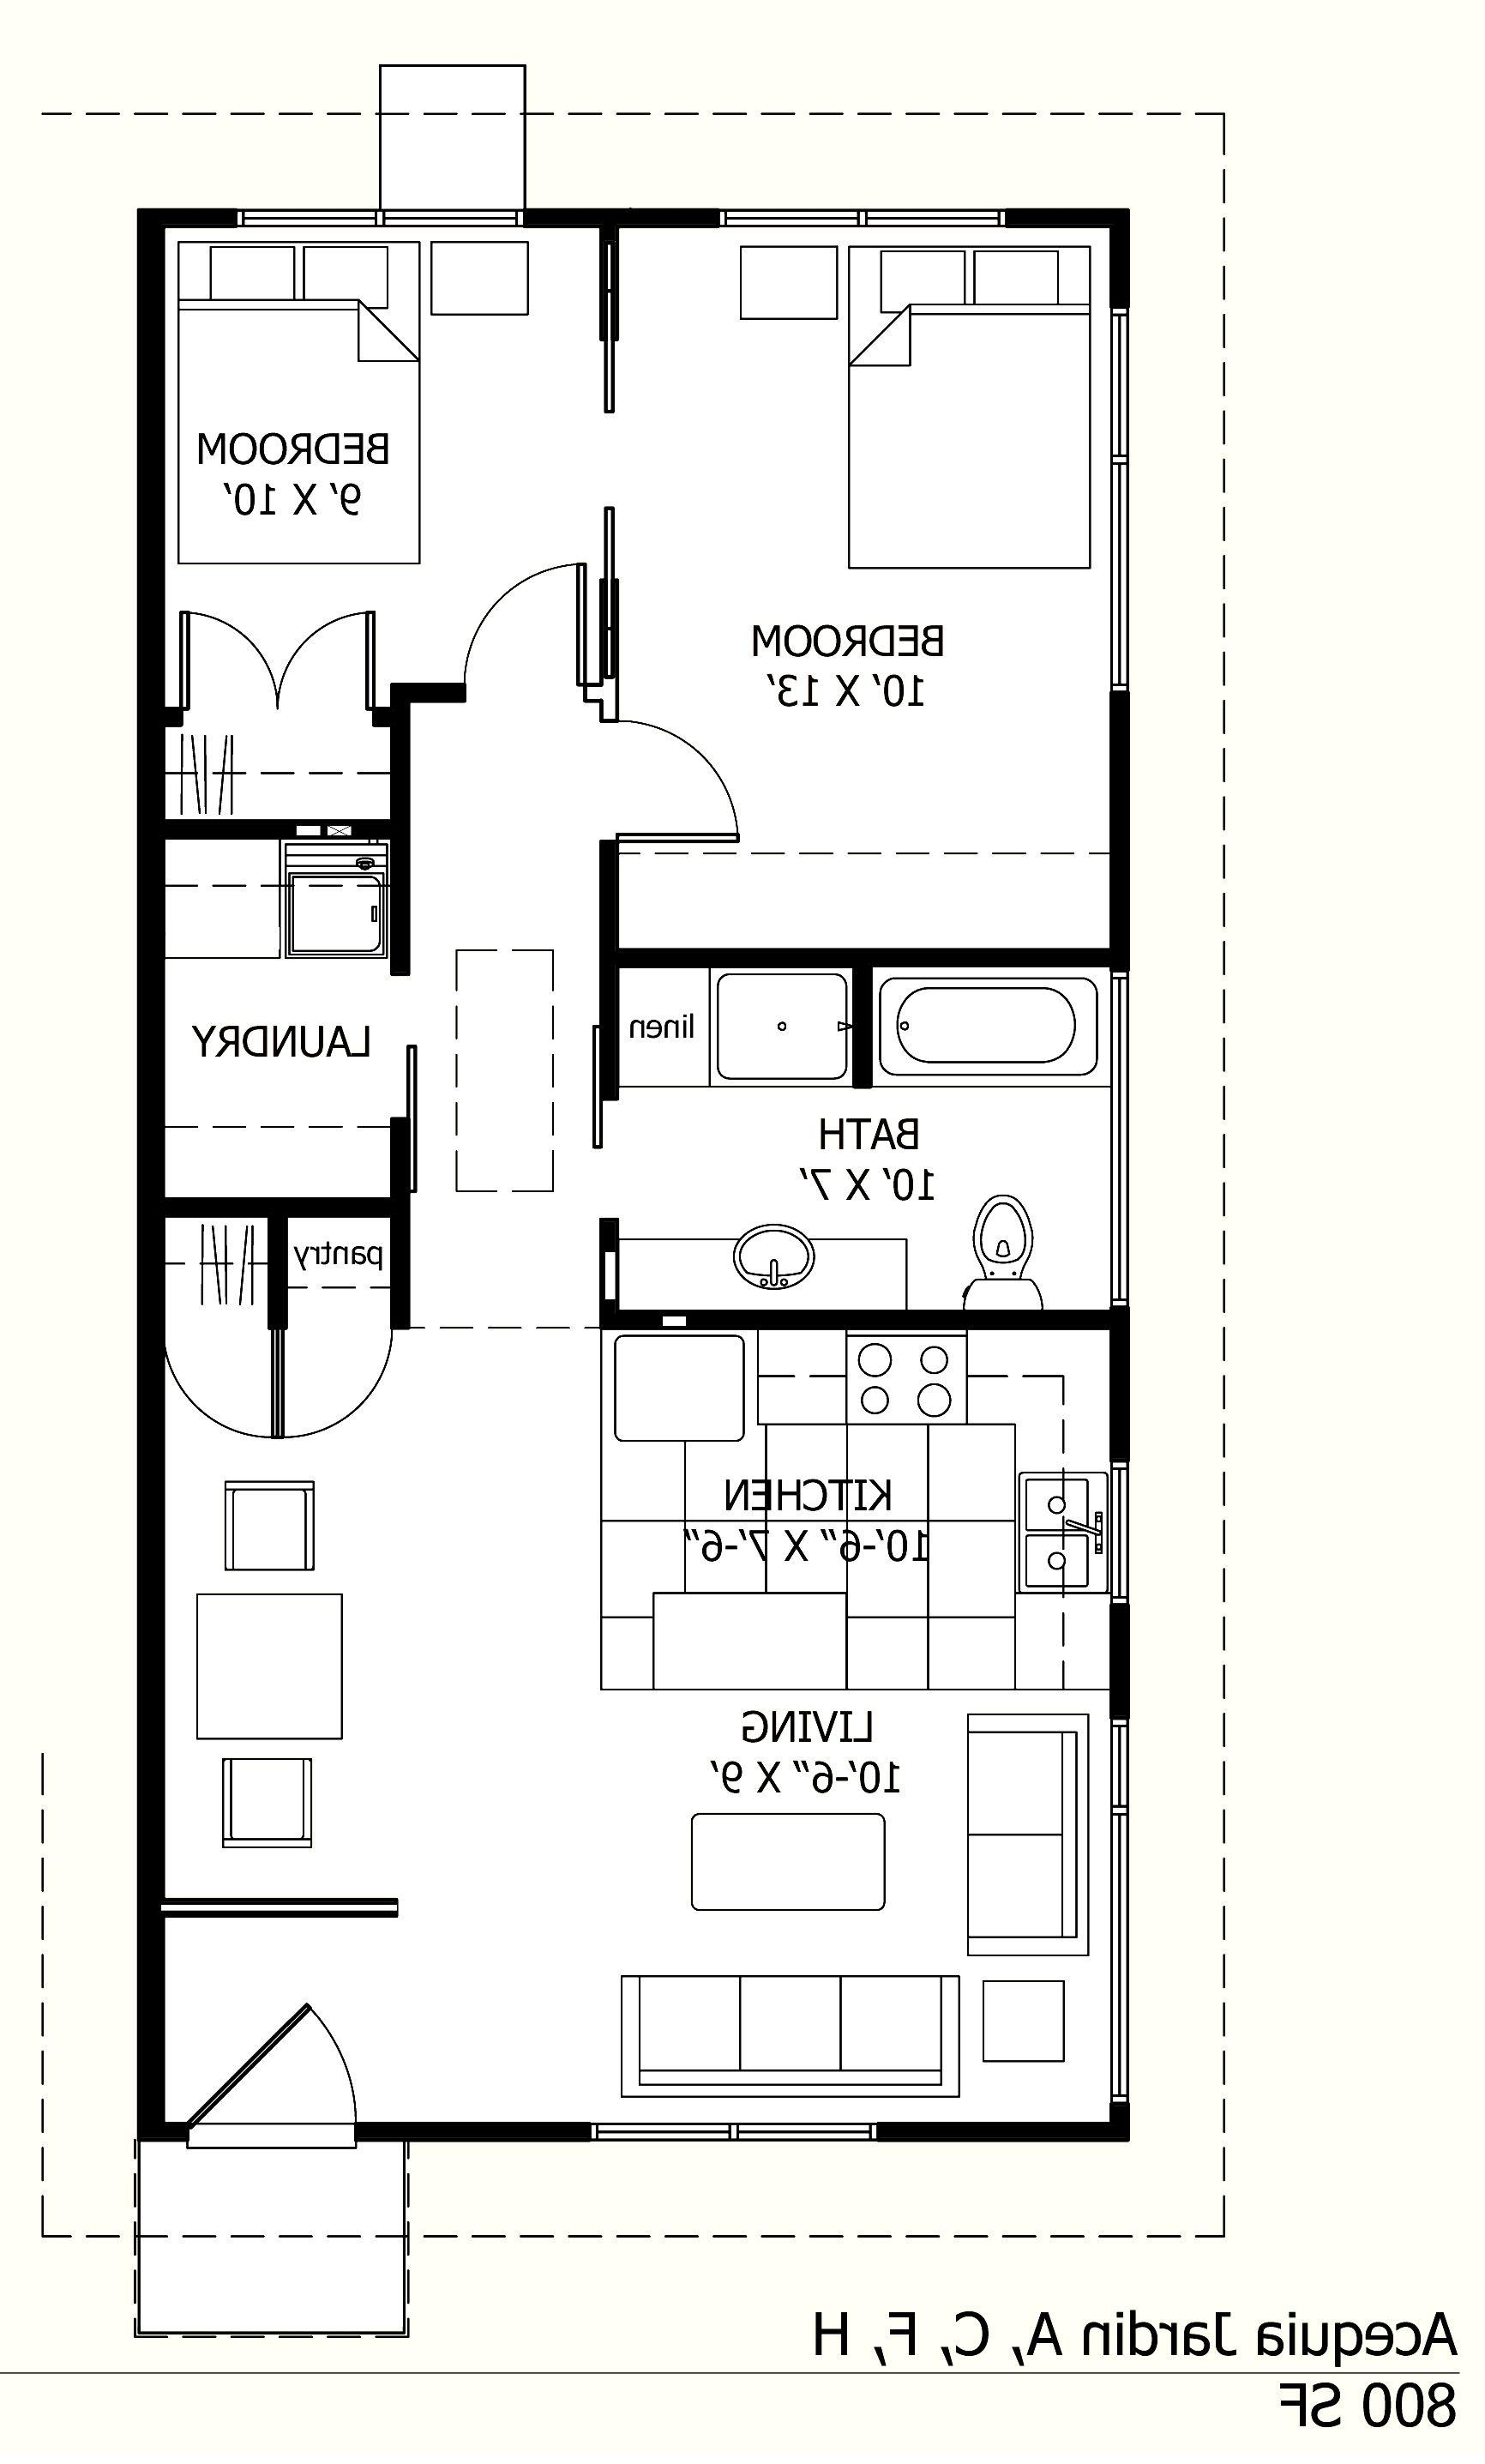 Image Result For 800 Sq Ft Home Plans California House Design Photos Floor Plan Design Home Design Plans